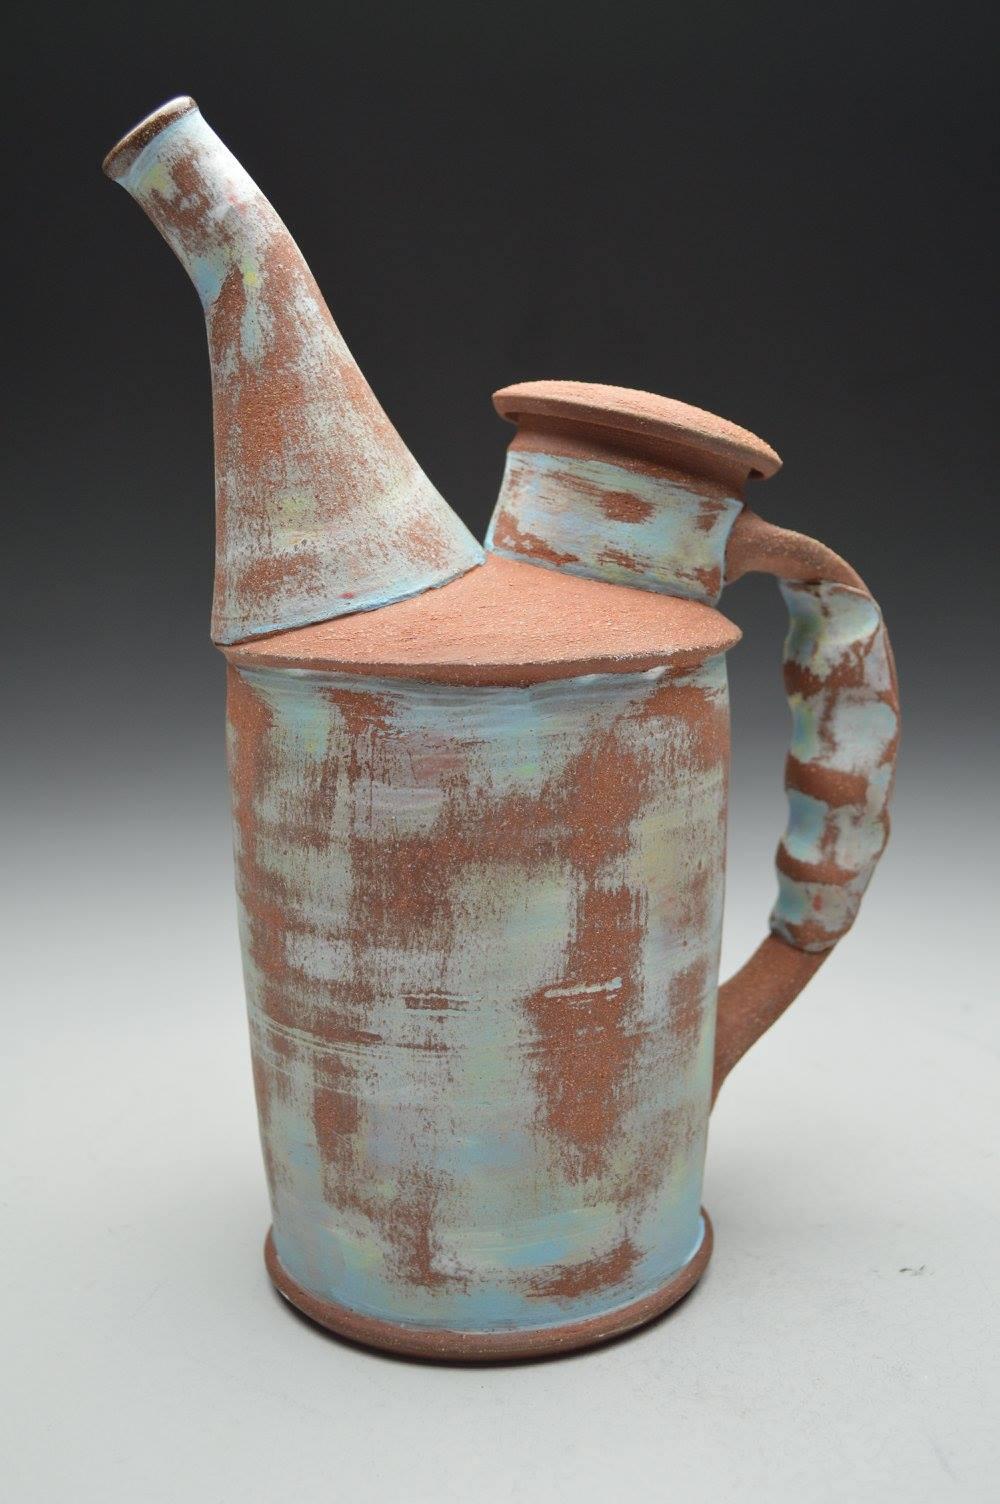 Oil Can Teapot